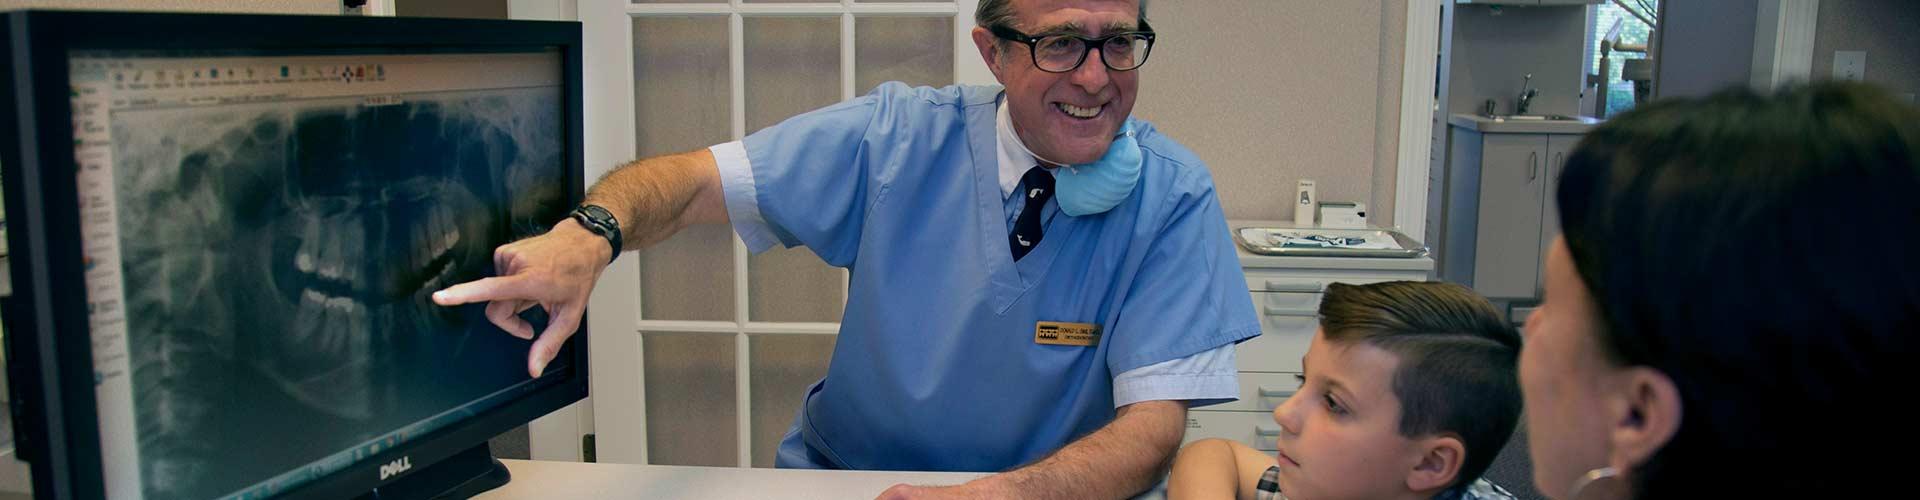 First Visit Exam Simi Orthodontics Norwood MA